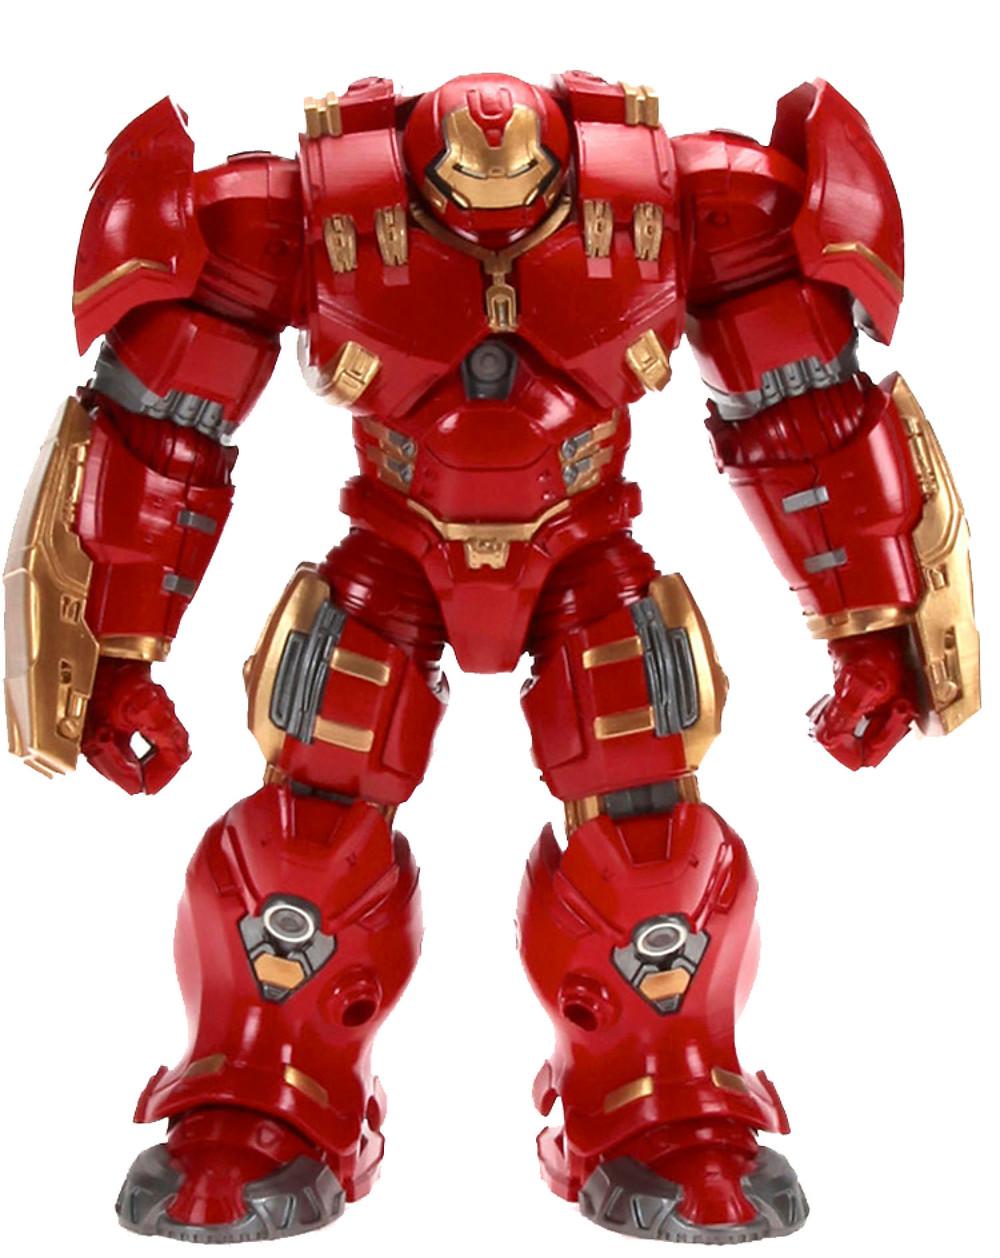 AvengersWave3-Hulkbuster-Build-a-Figure.jpg